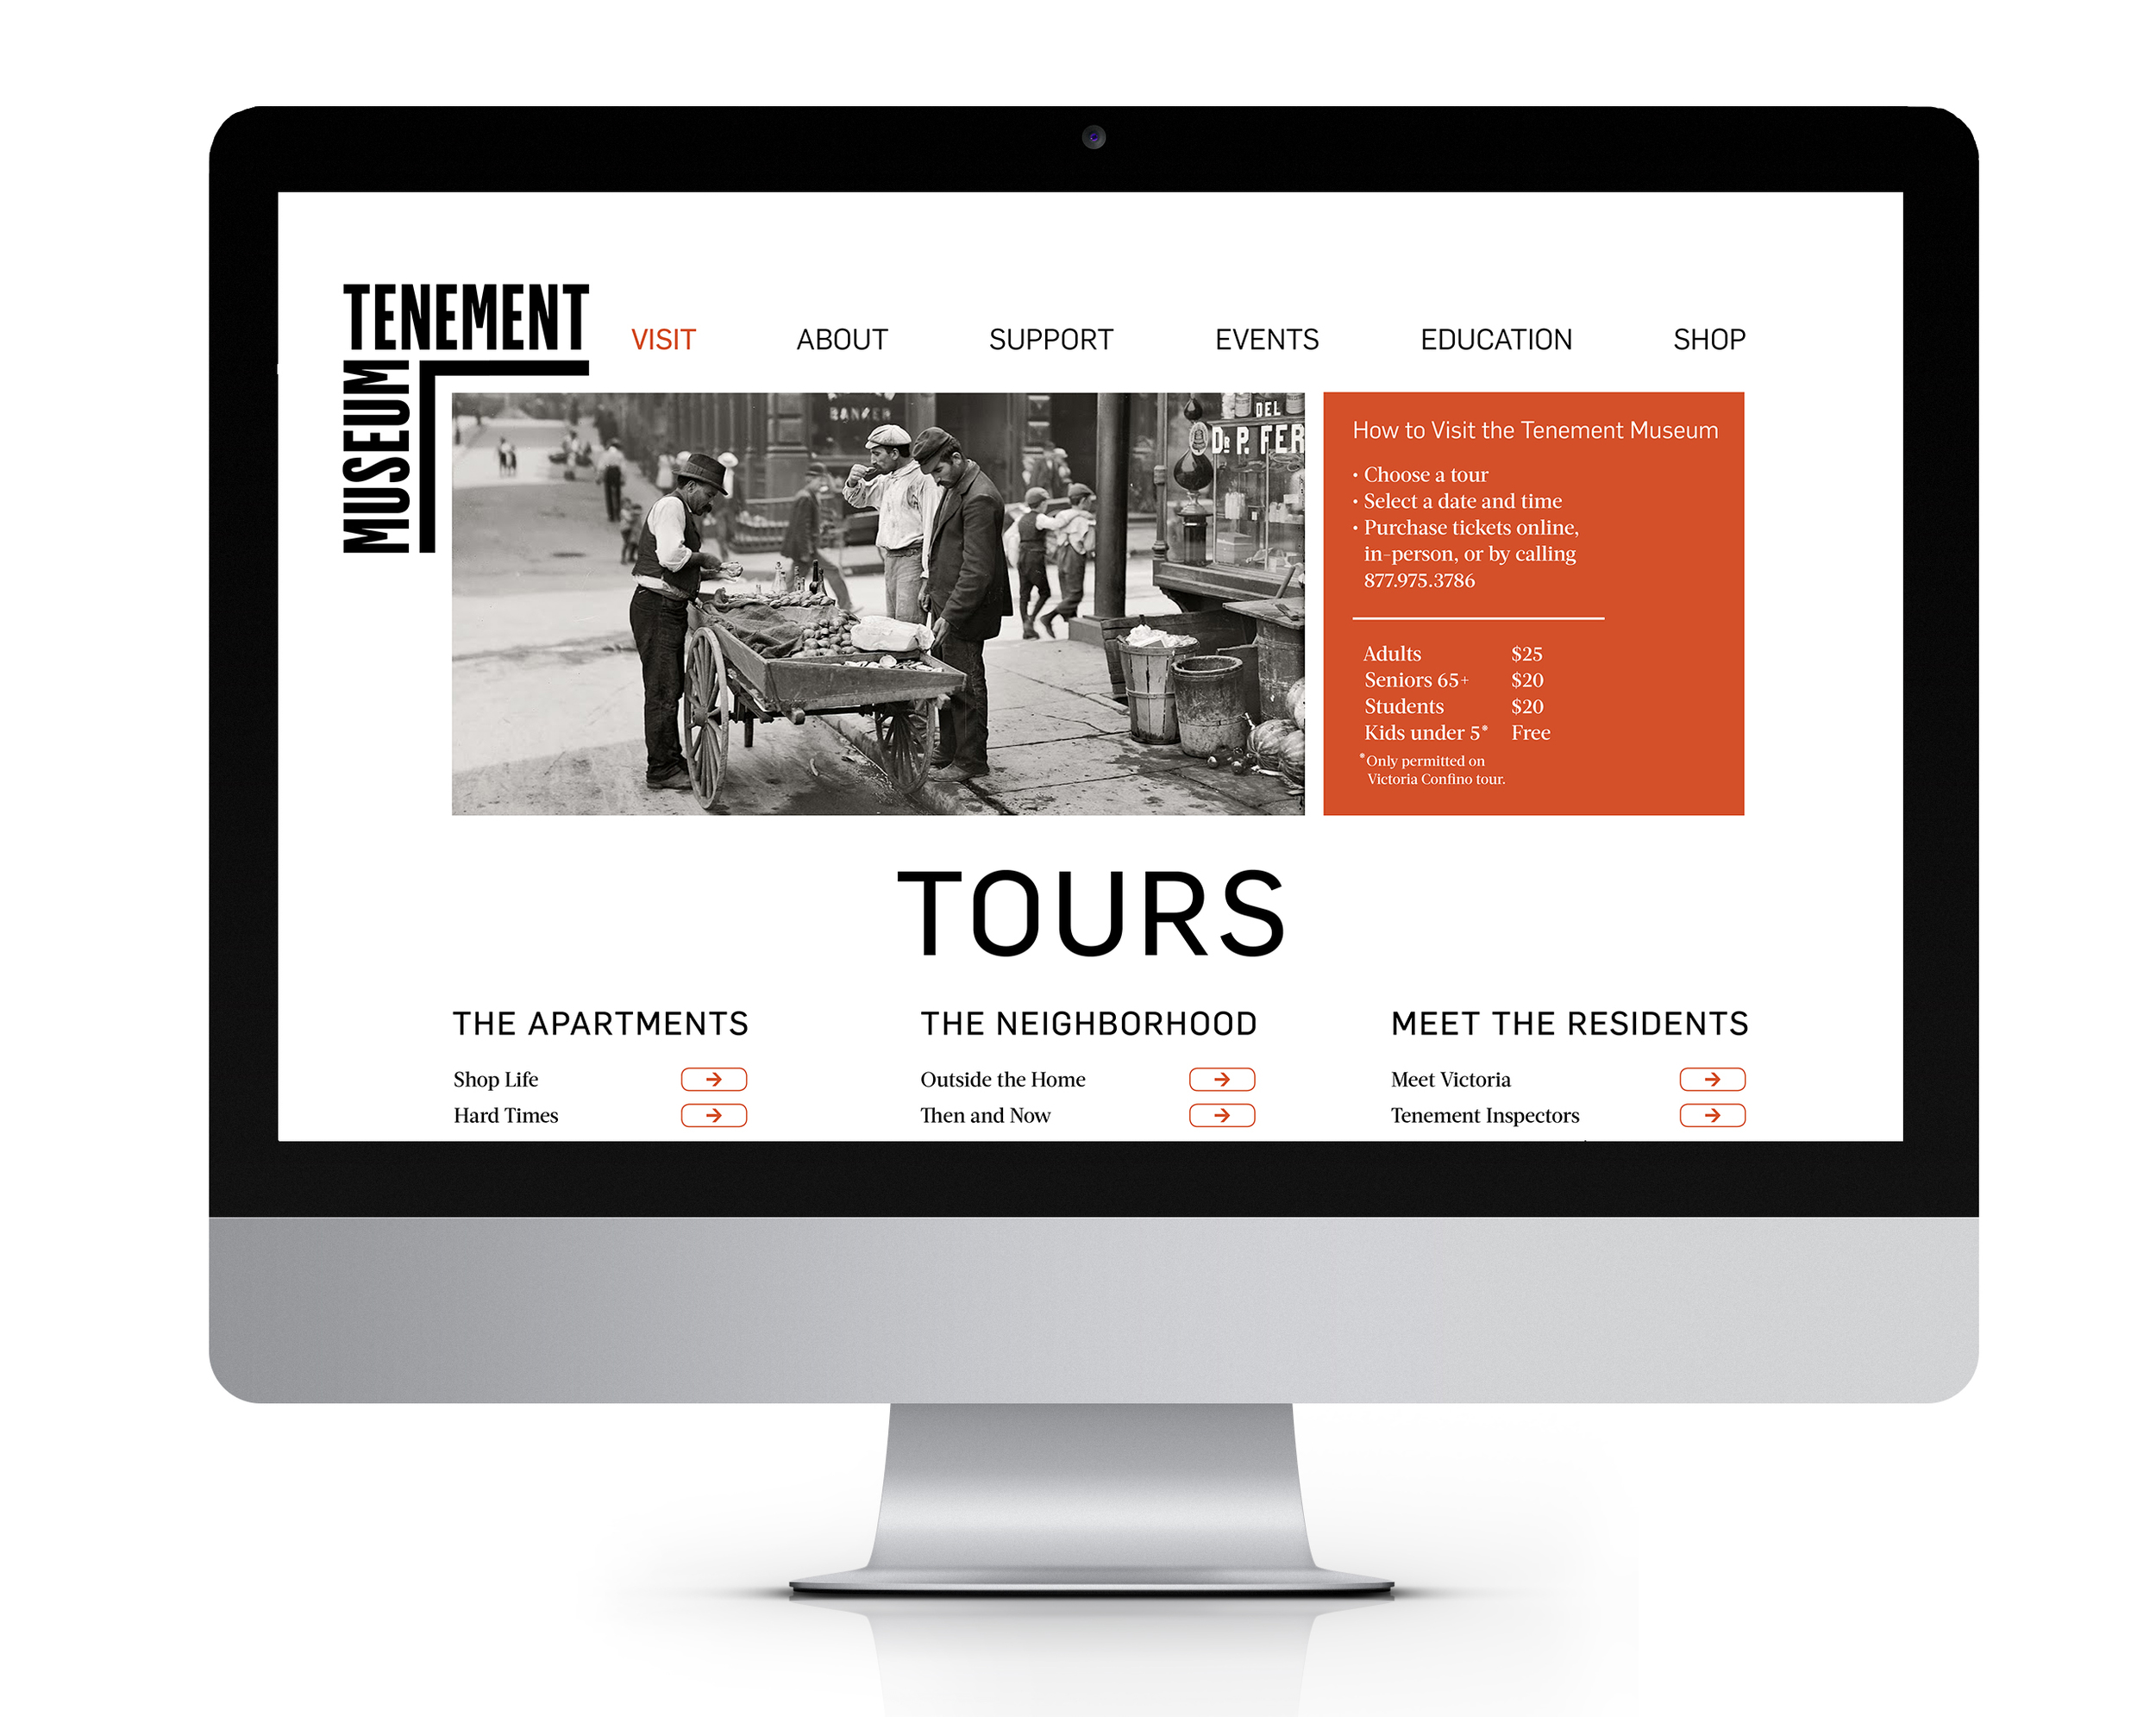 tenement_website_visit.jpg